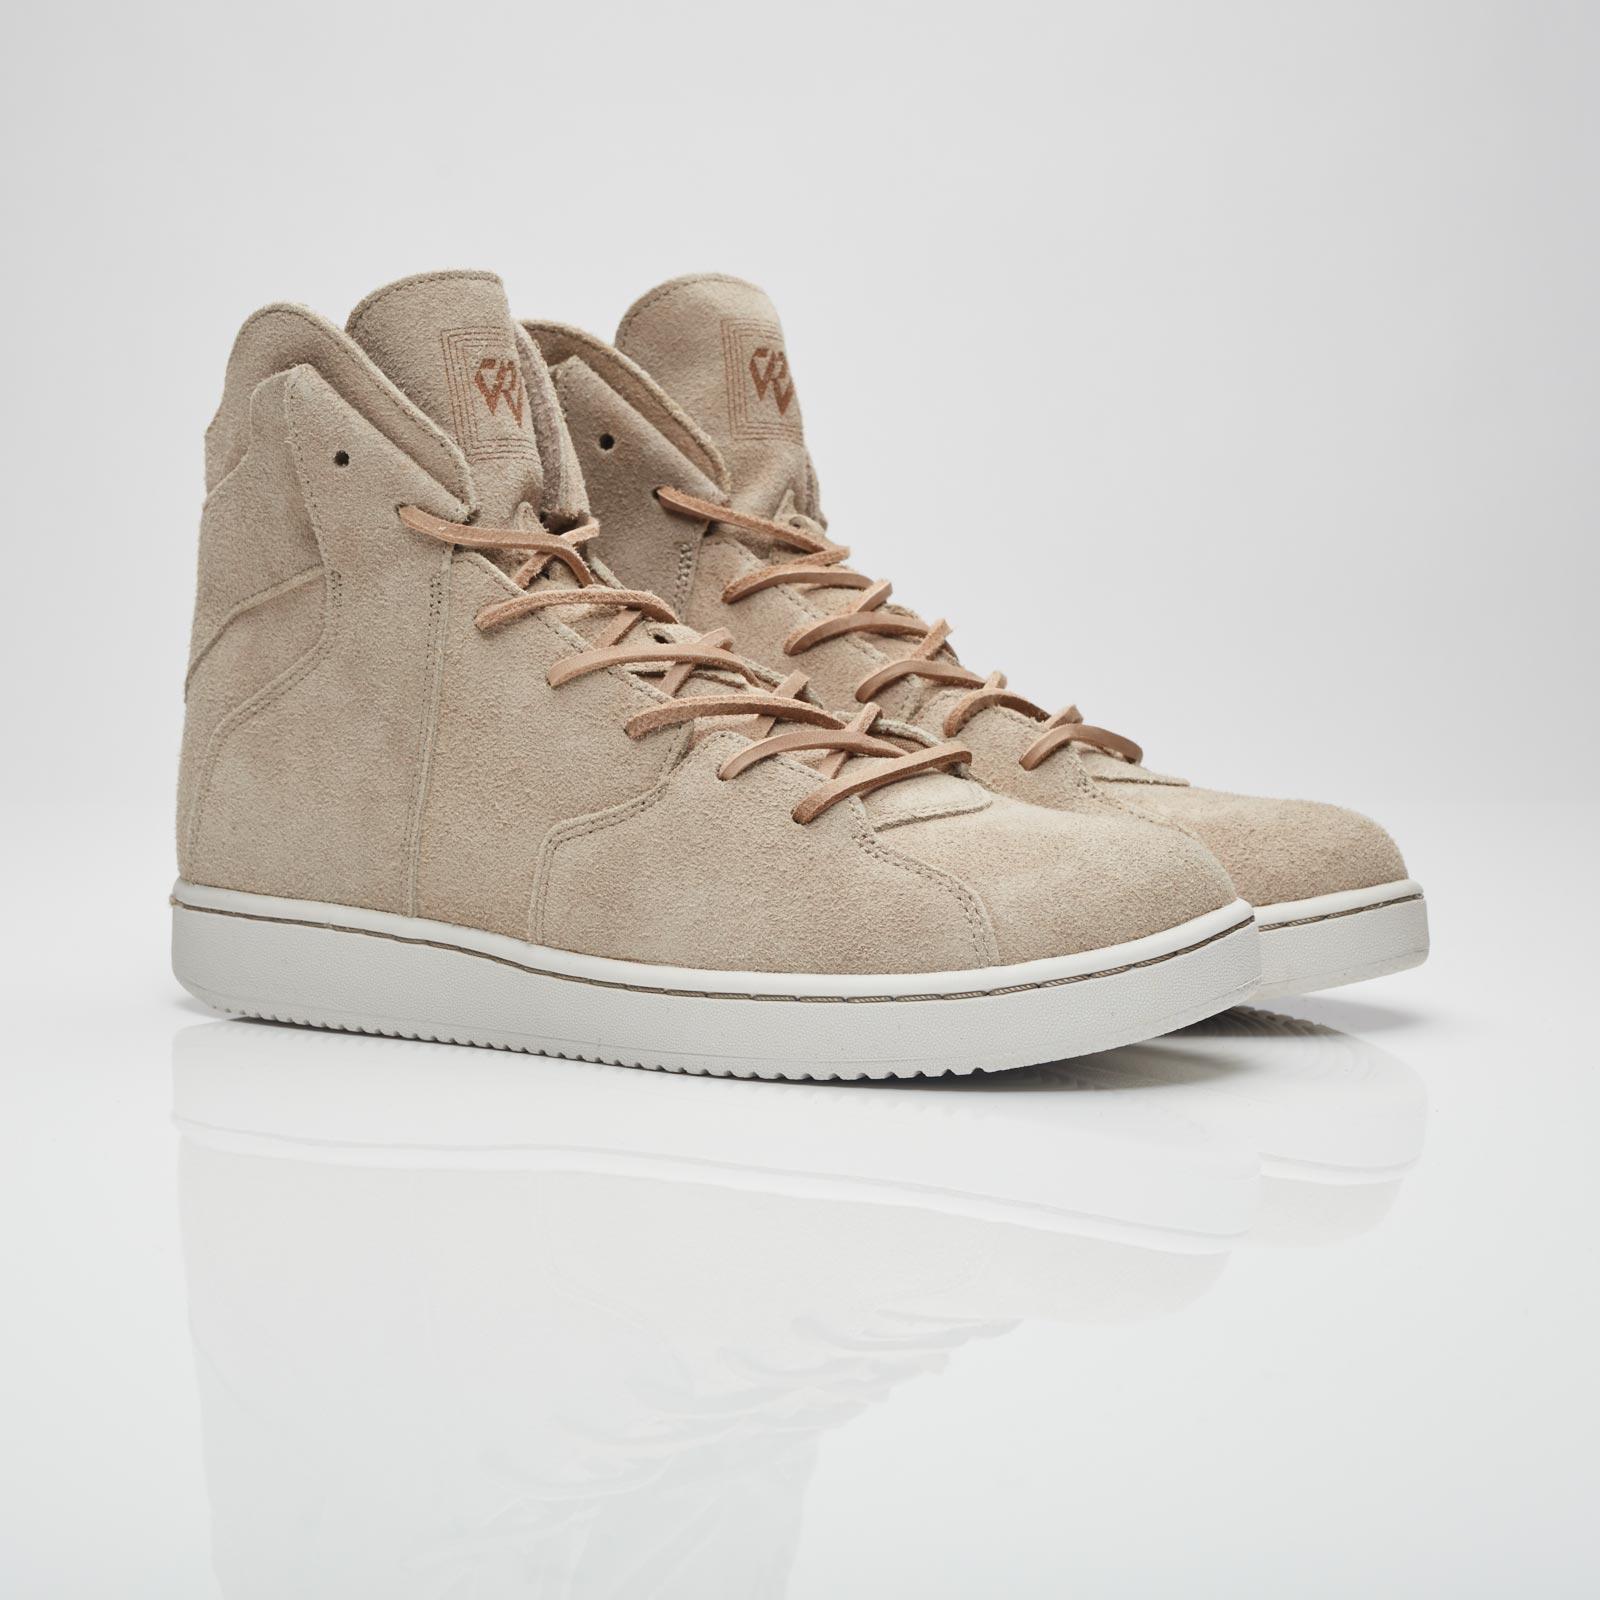 2f1a45c2c098 Jordan Brand Jordan Westbrook 0.2 - 854563-209 - Sneakersnstuff ...